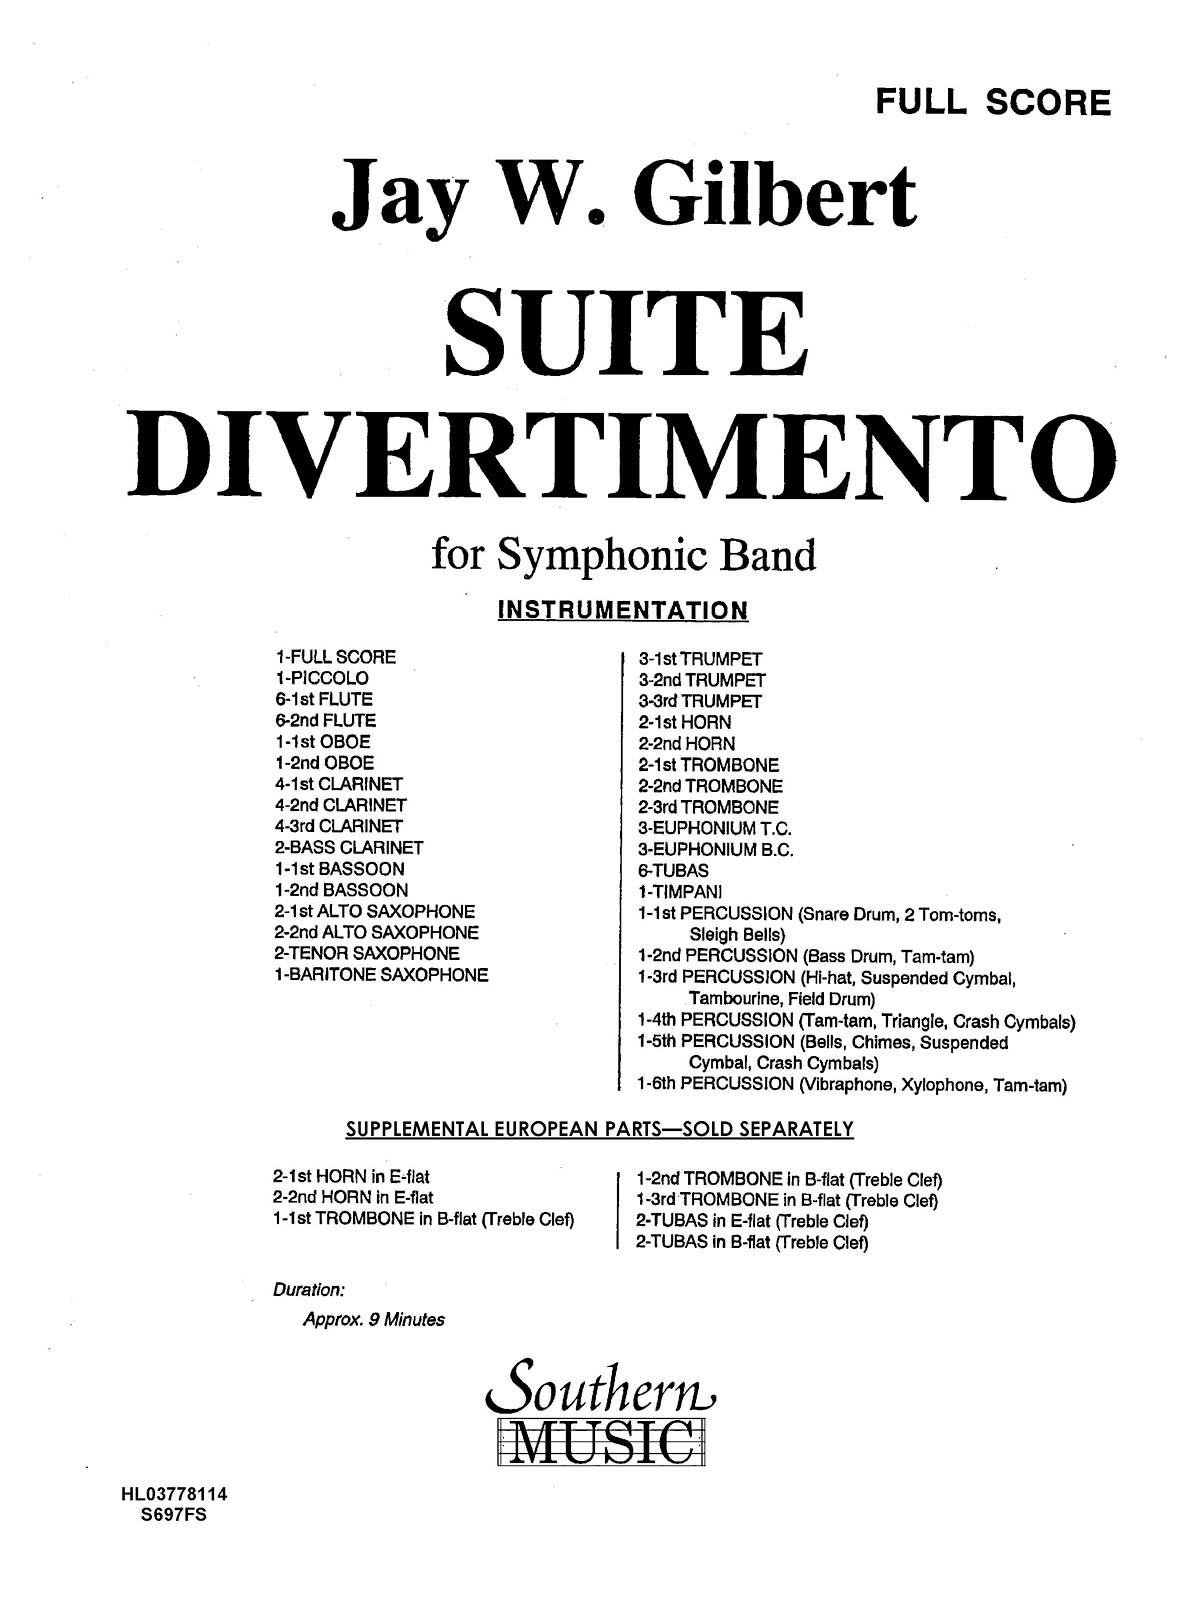 Jay W. Gilbert: Suite Divertimento: Concert Band: Score